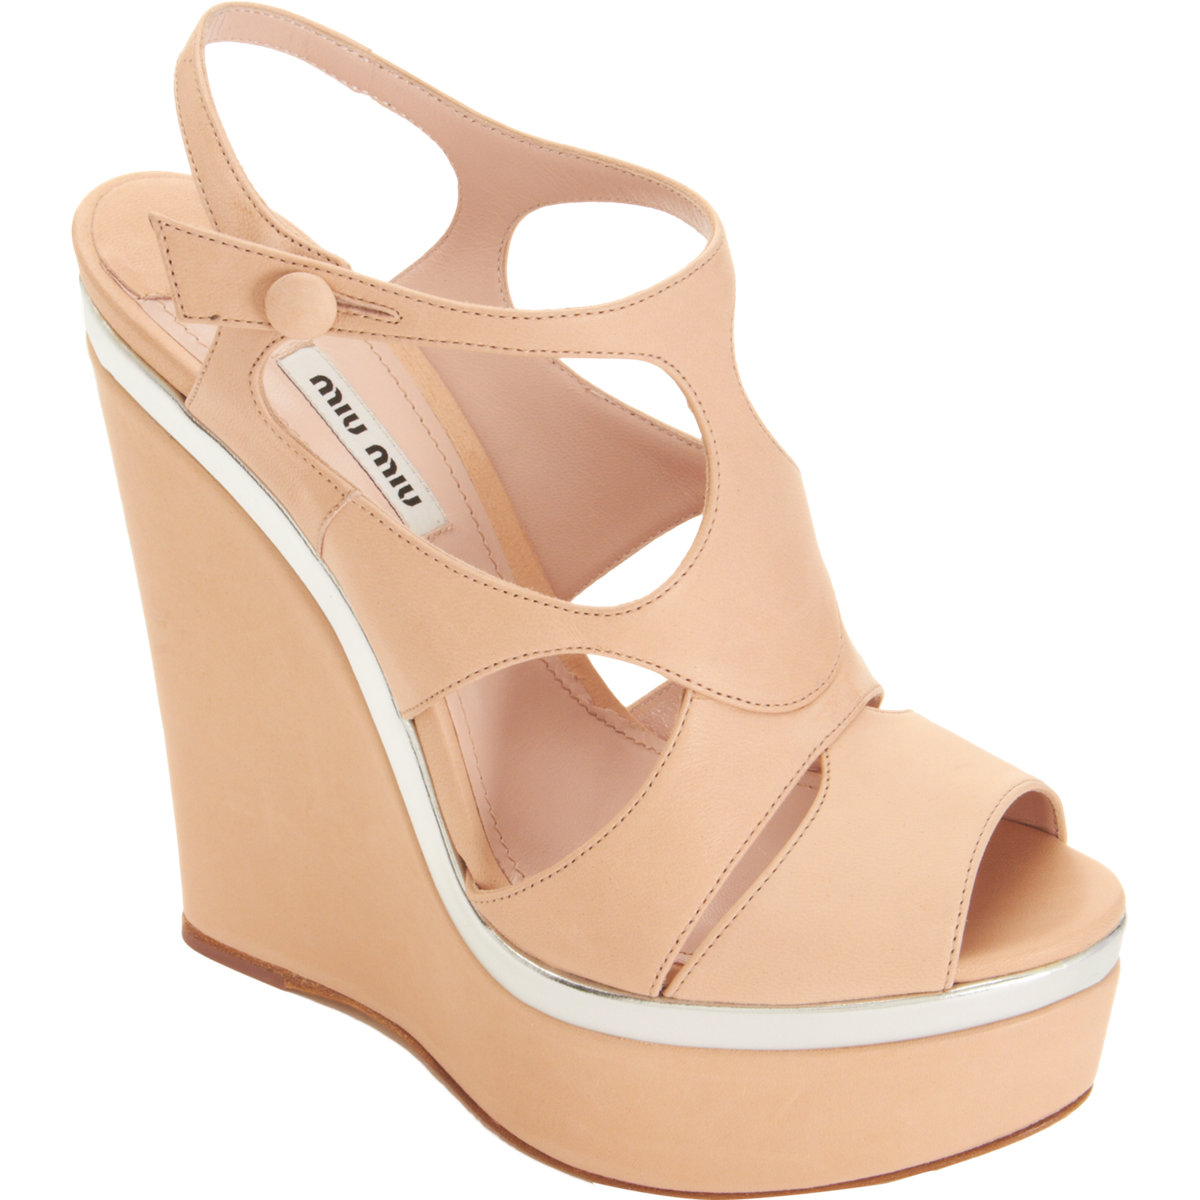 Miu Miu Platform Court Shoes